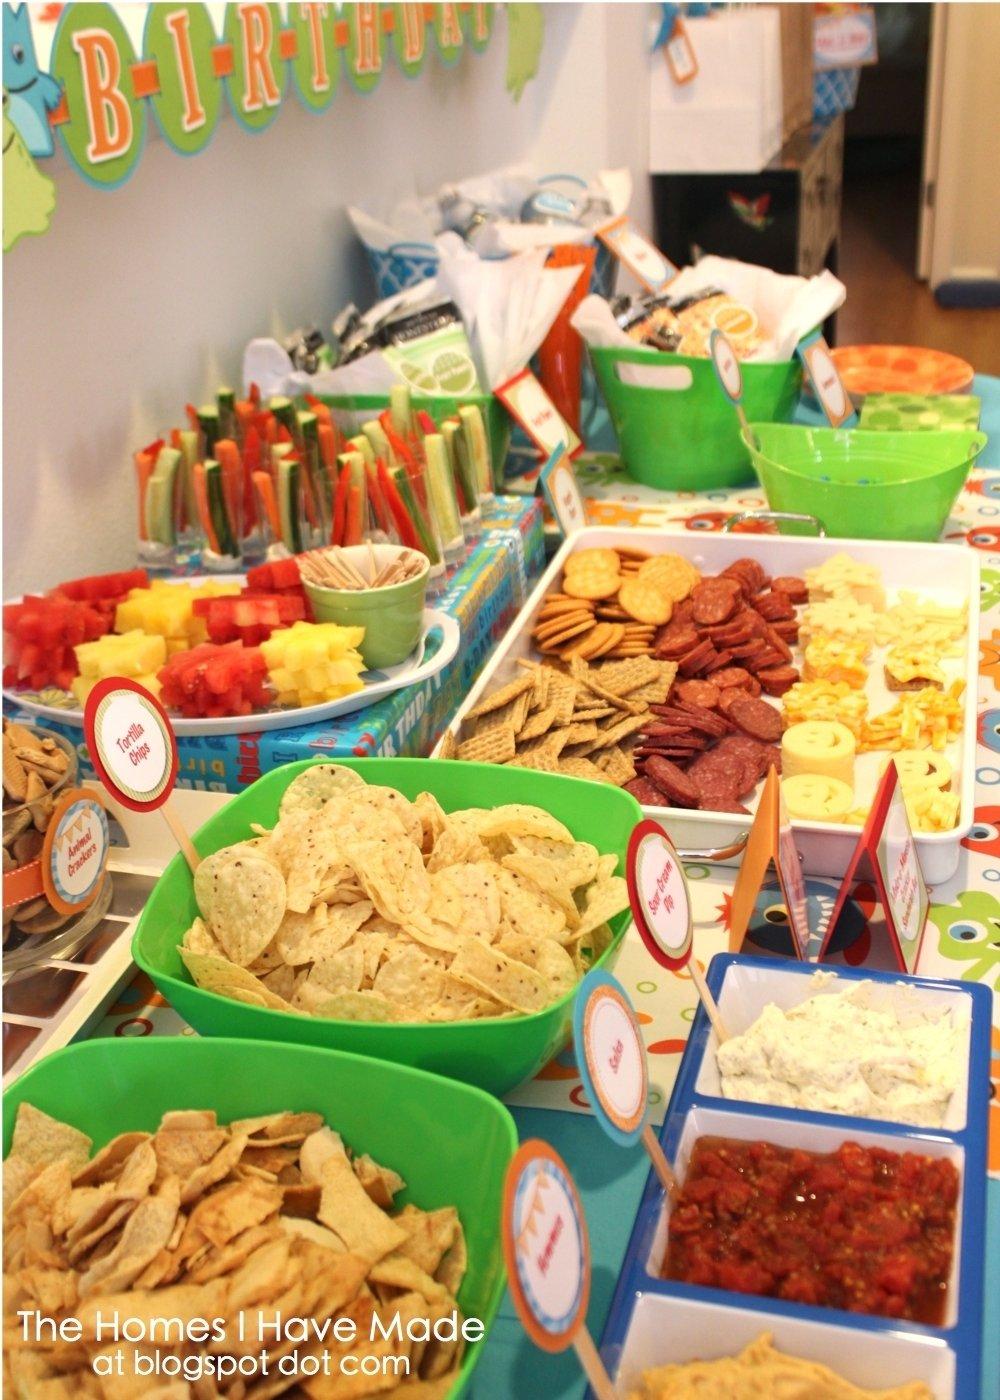 10 Elegant Birthday Party Finger Food Ideas monster party spotlight on food finger foods finger and bowls 1 2020